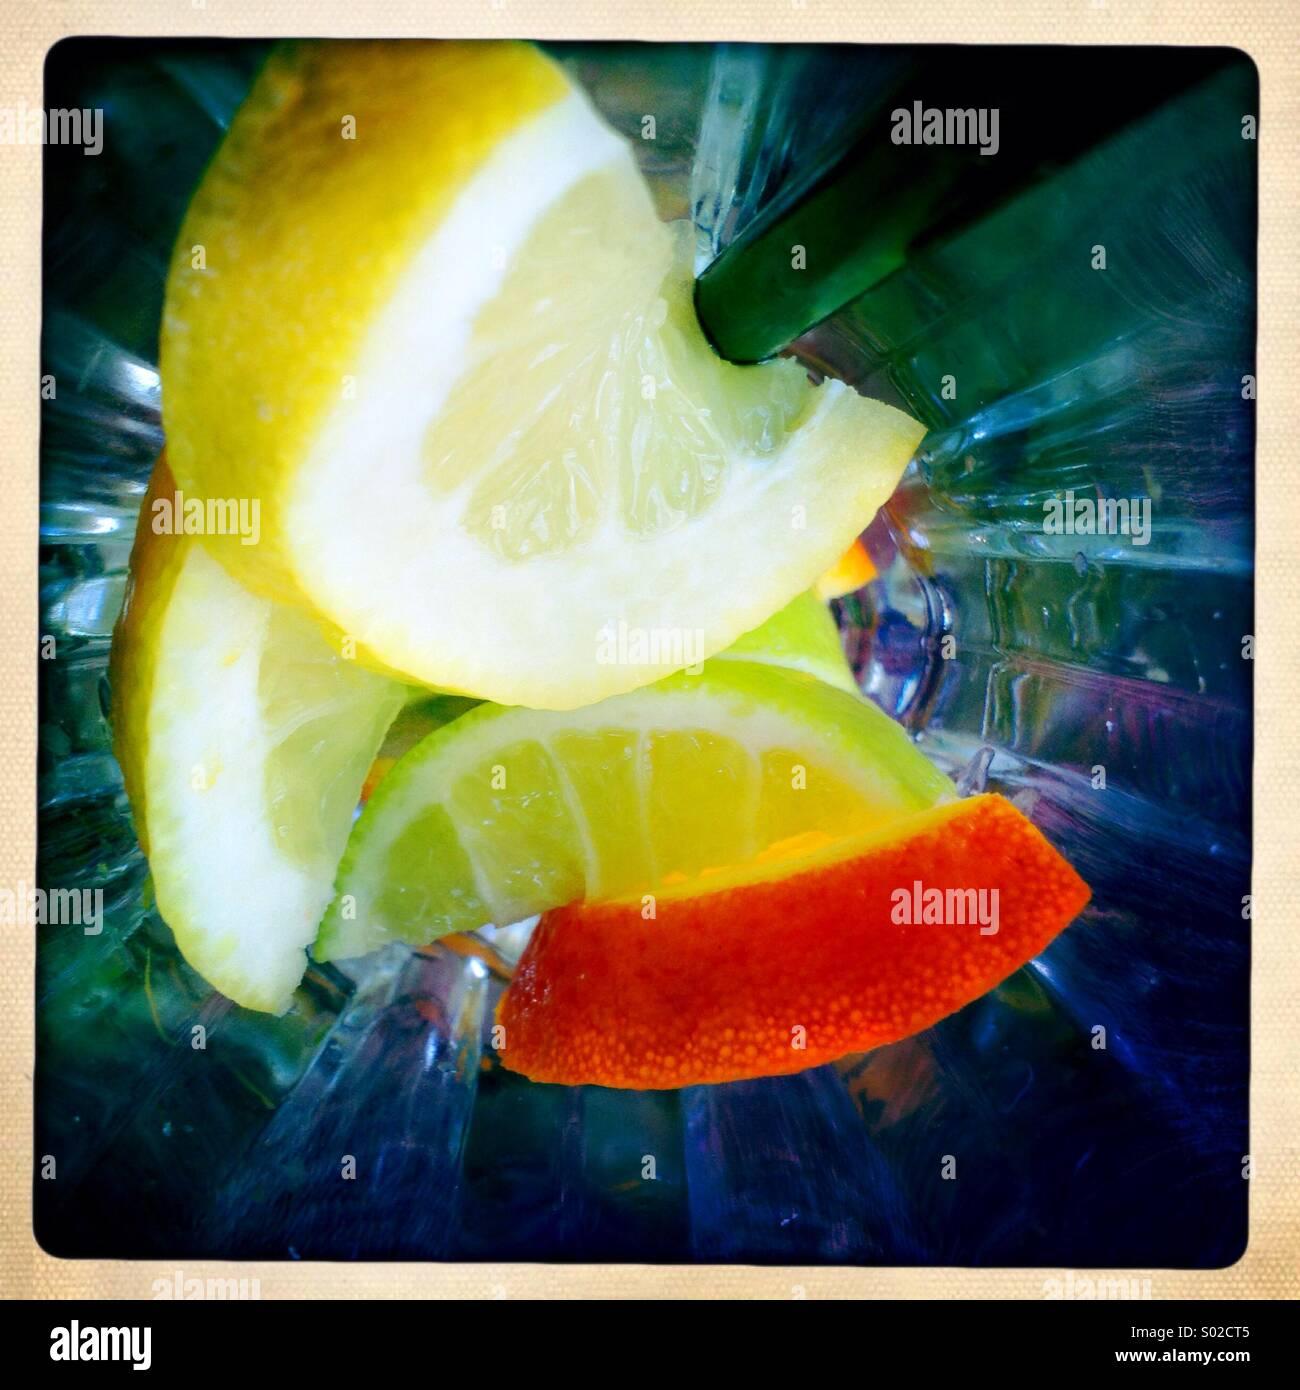 Lemon and orange slices - Stock Image